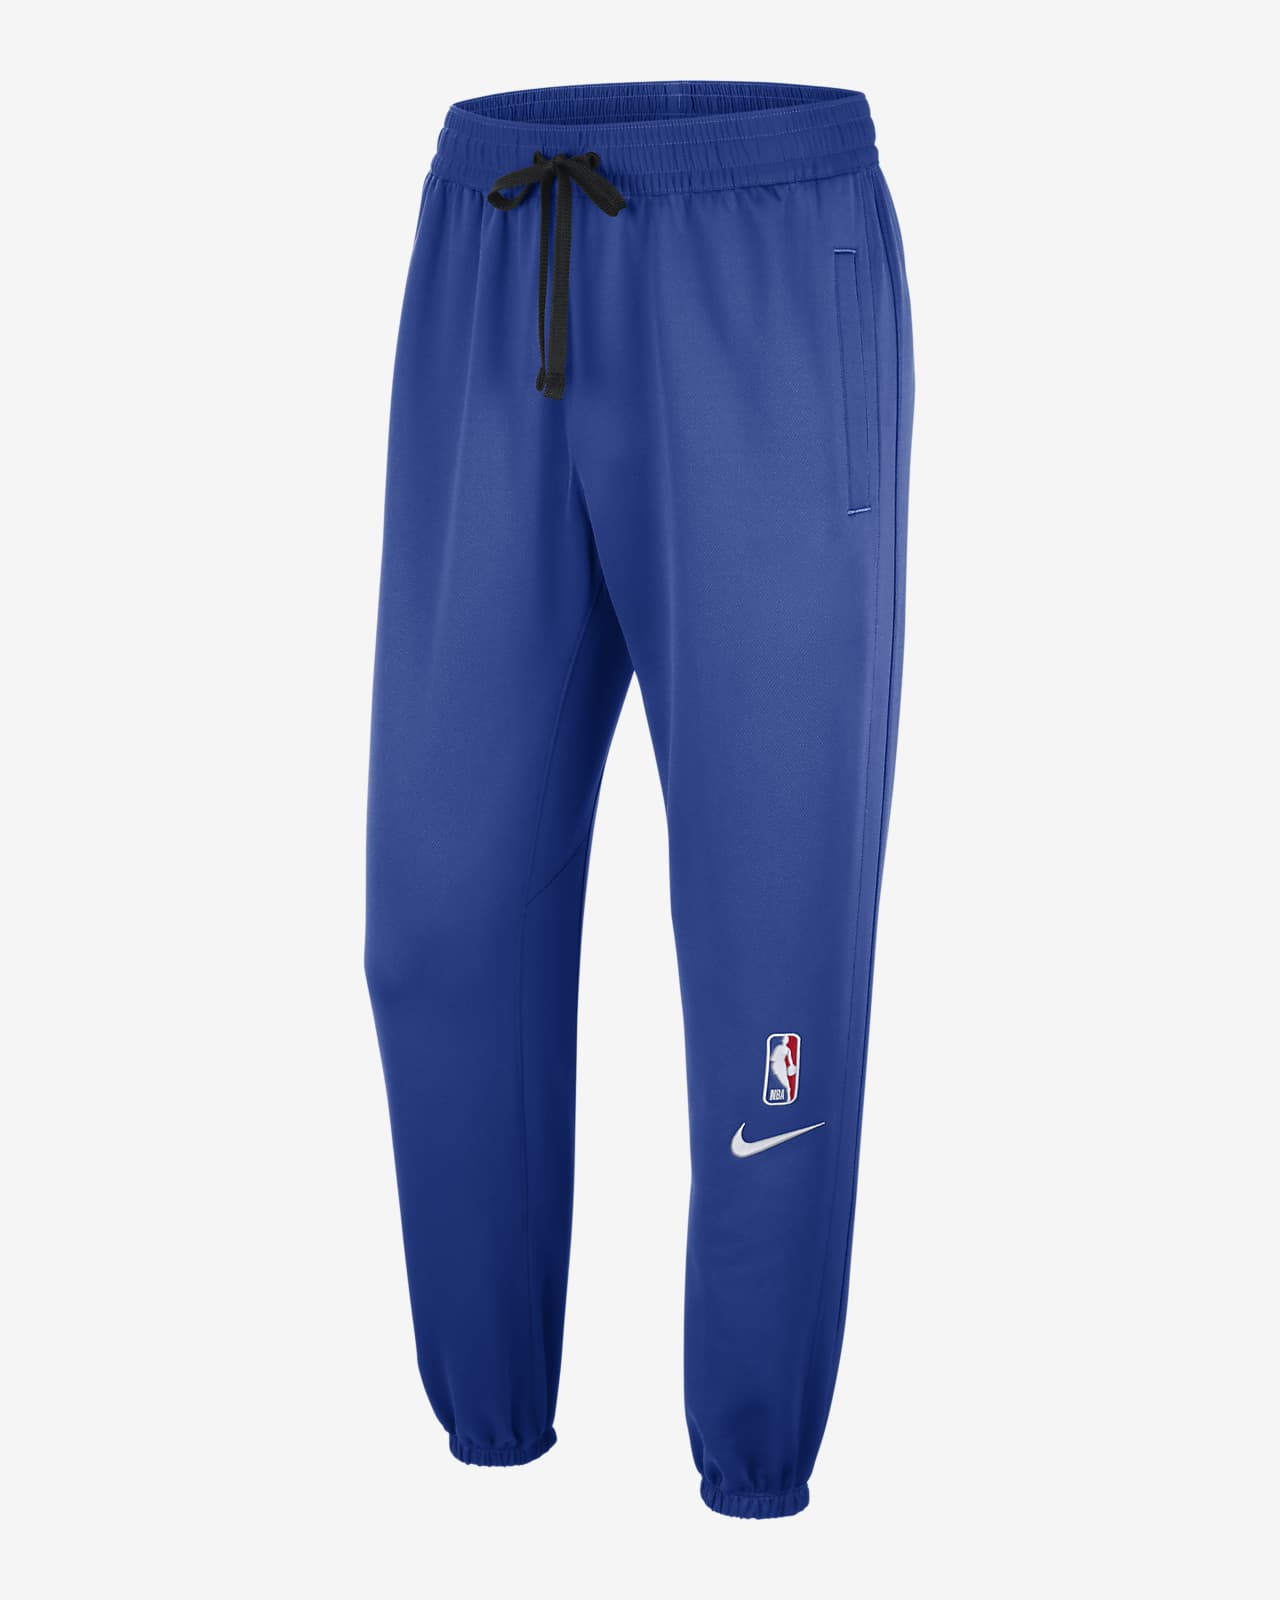 Golden State Warriors Showtime Nike Therma Flex NBA bukse til herre